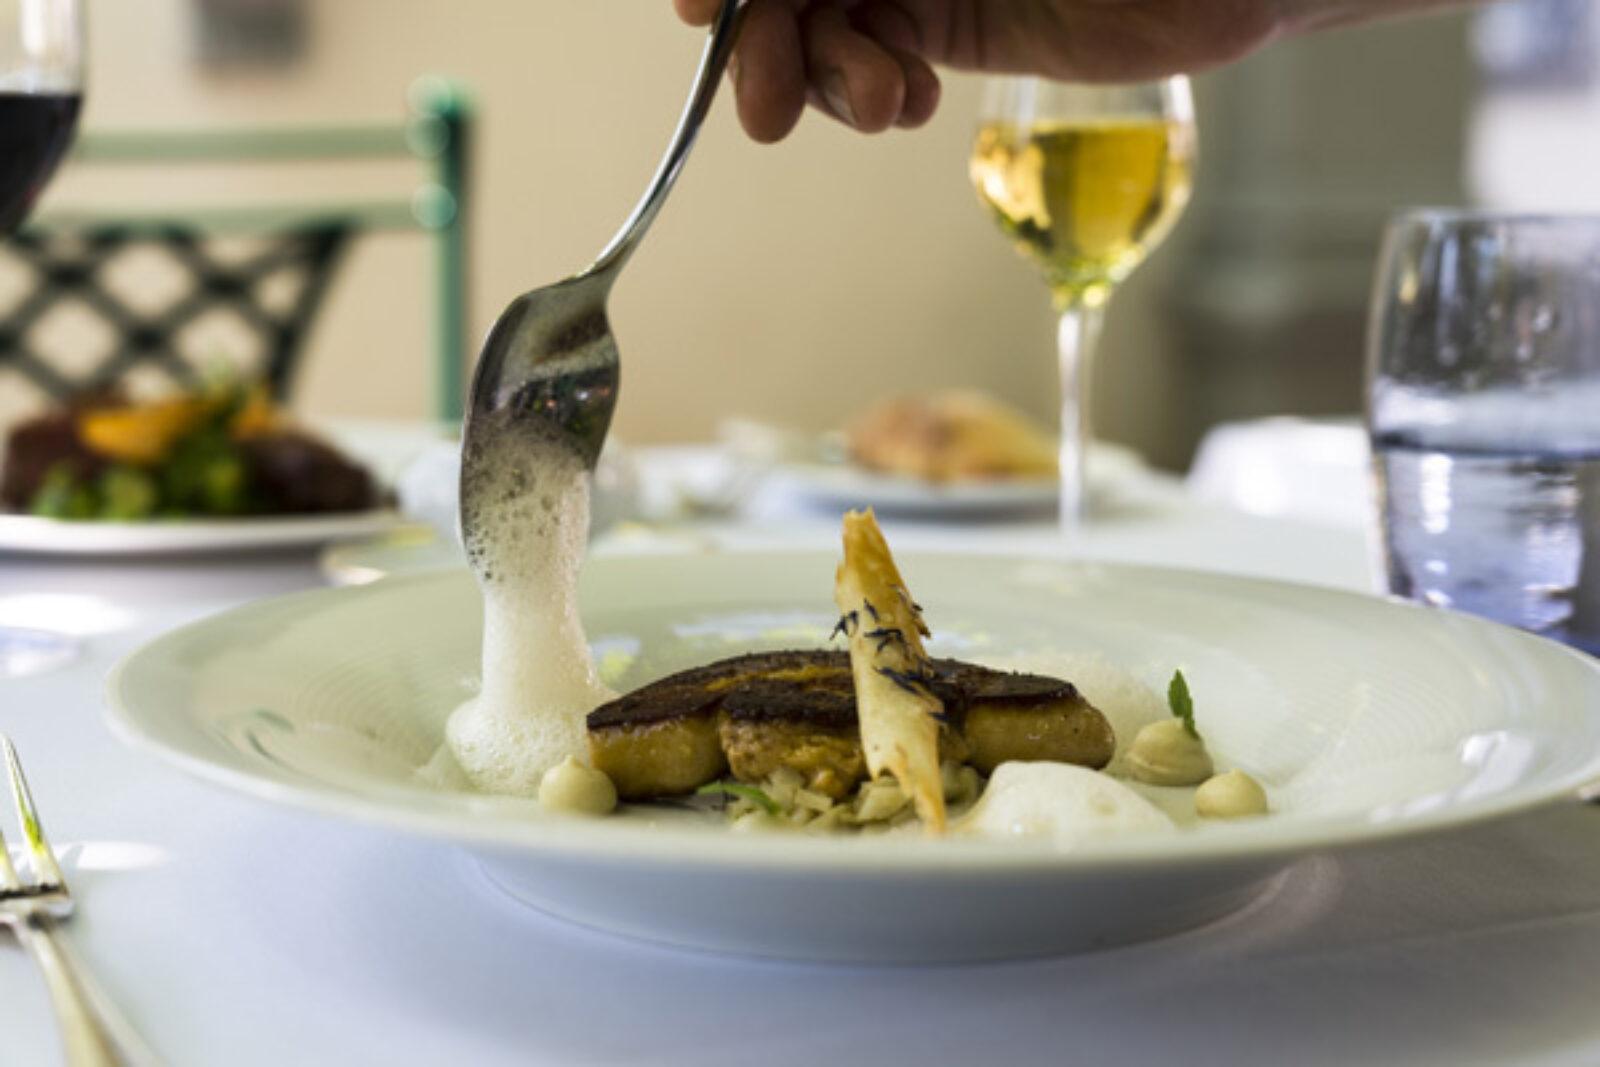 Schloss bottmingen food 1 md